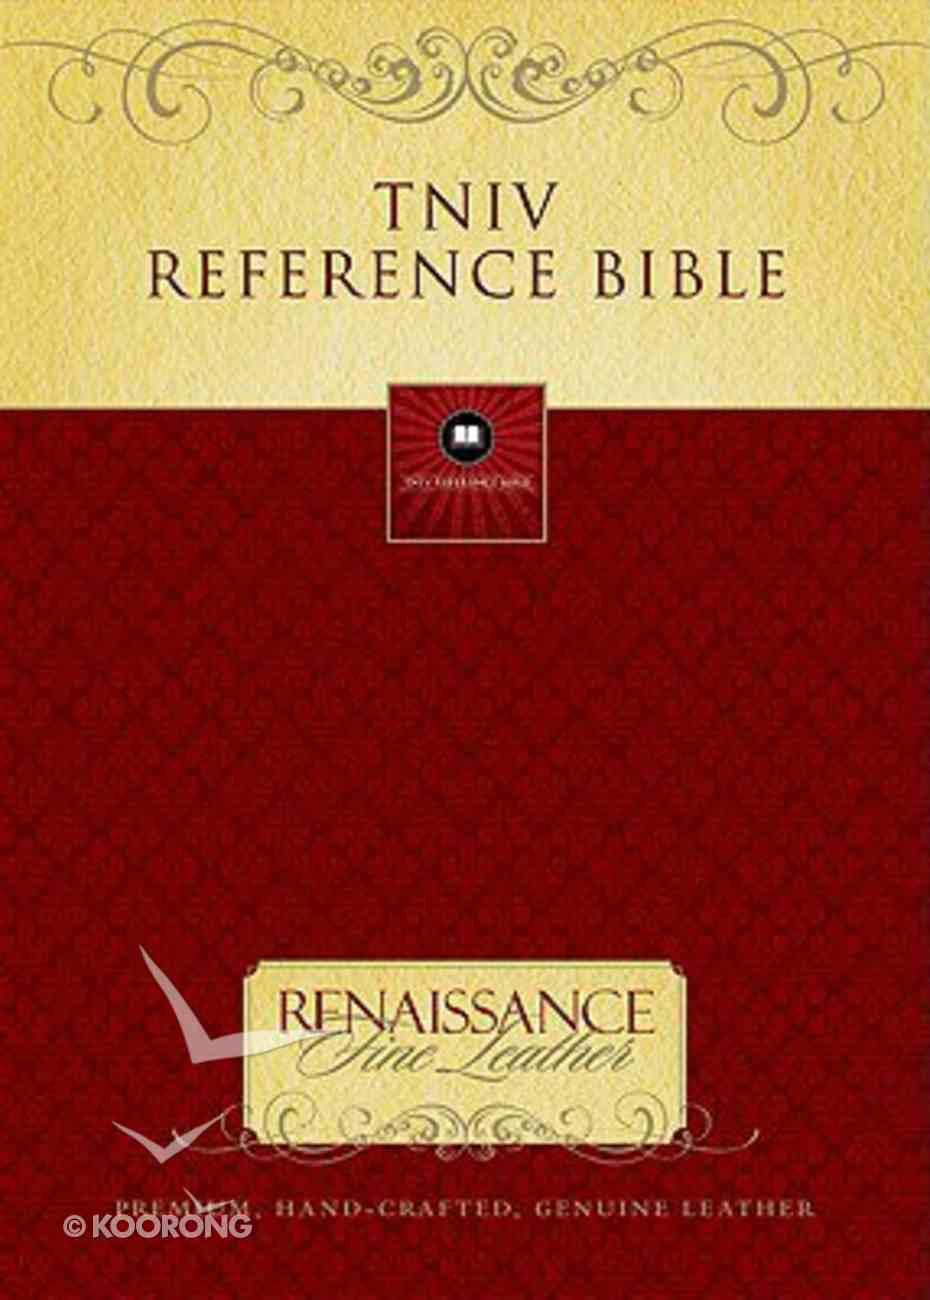 TNIV Reference Bible Black Genuine Leather